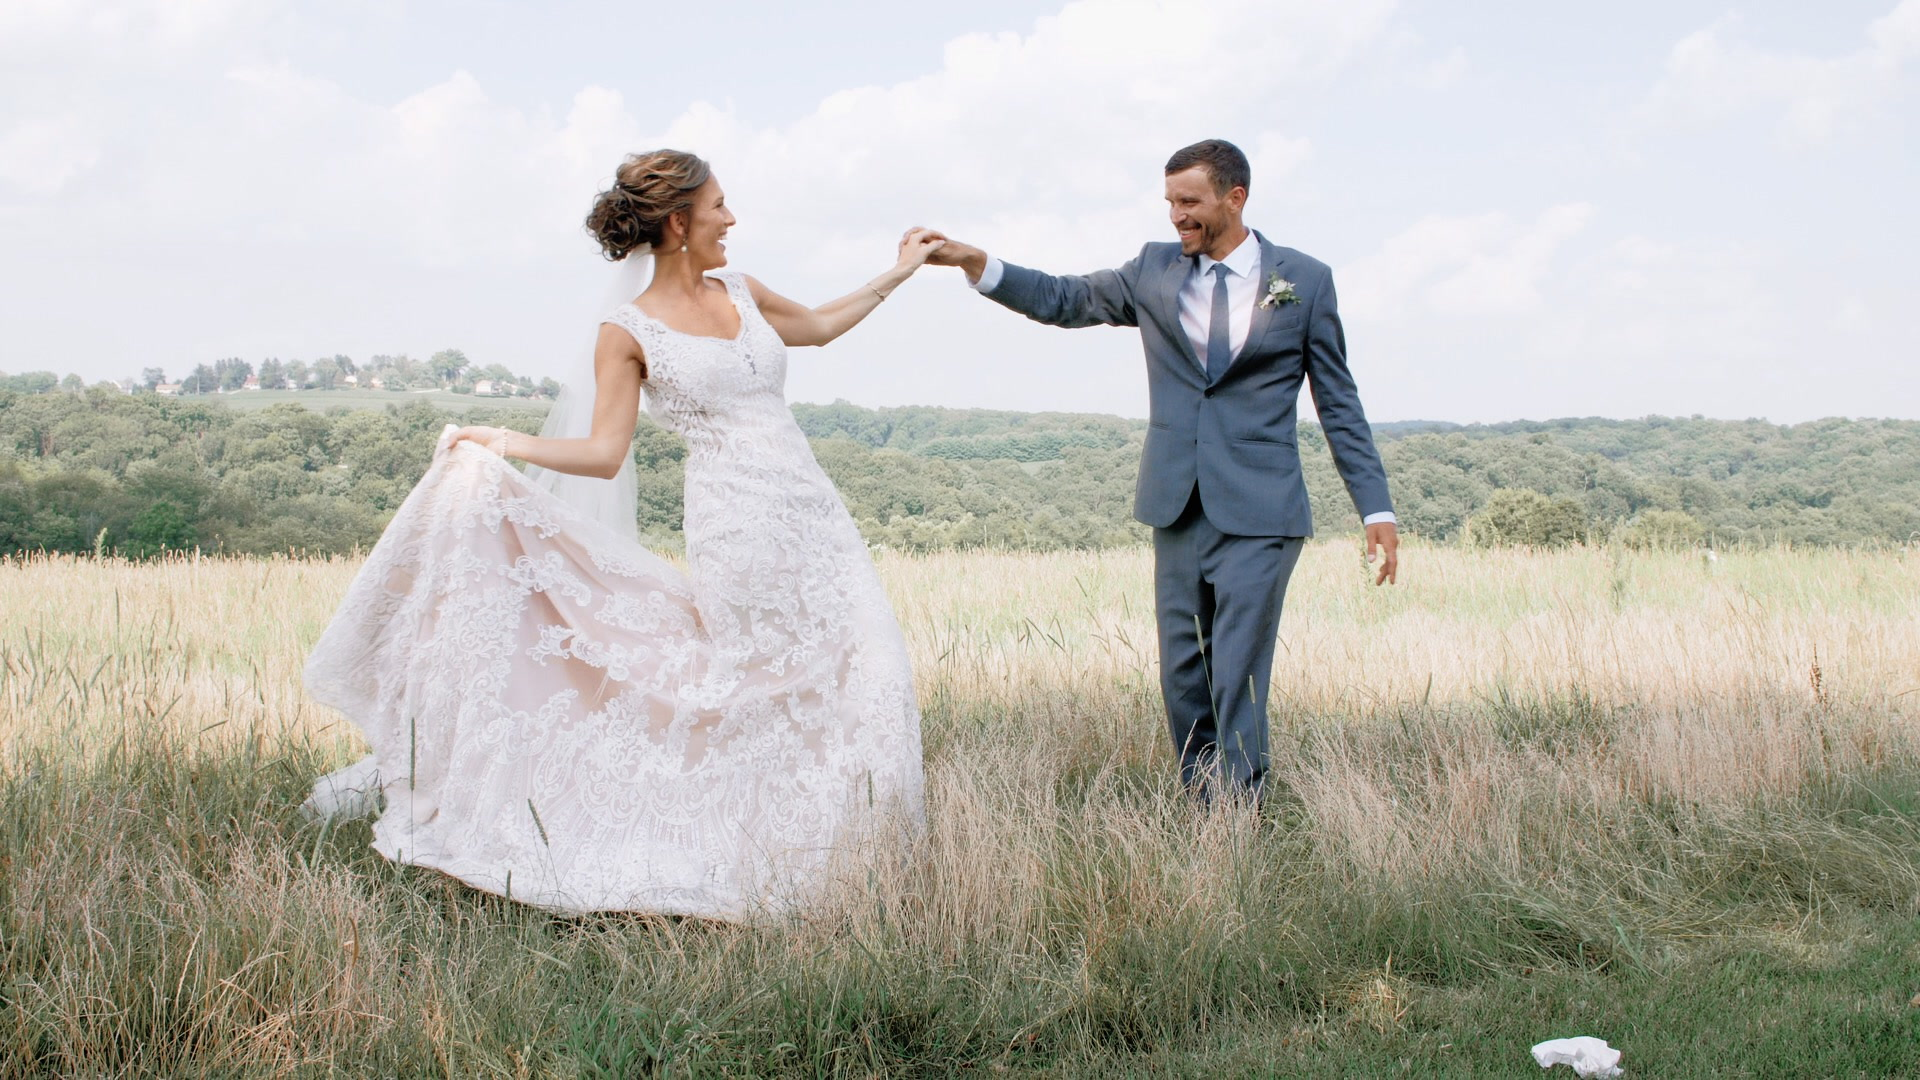 Ashley + Andrew | Dallastown, Pennsylvania | Wyndridge Farm